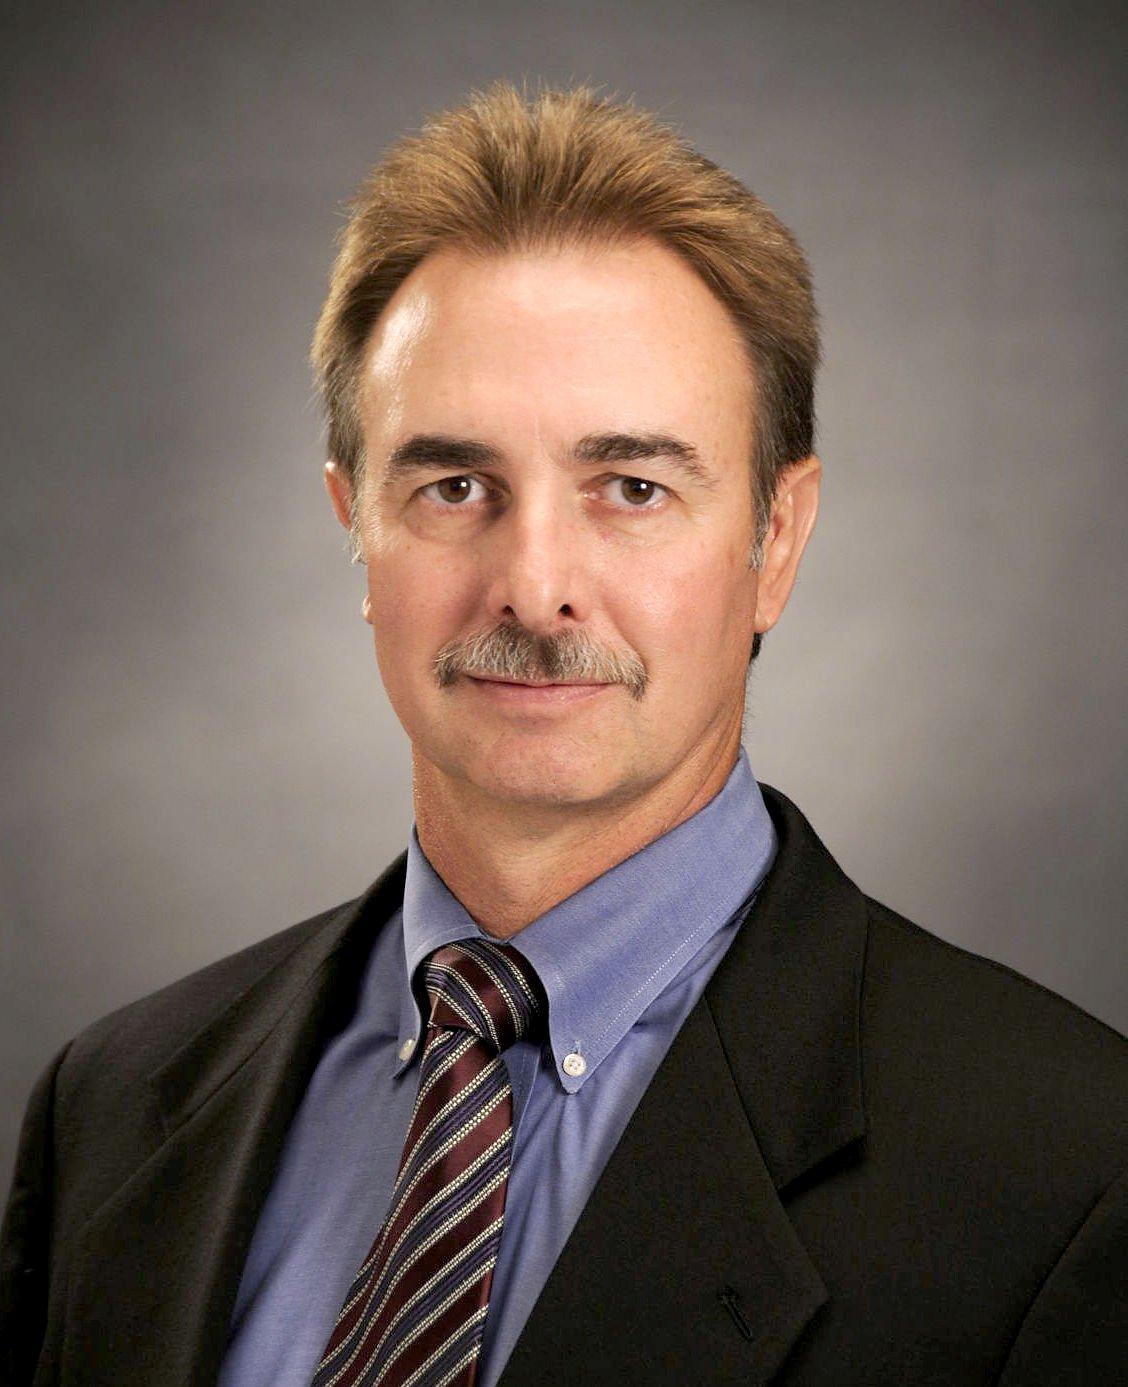 Dr. Mark Anderson